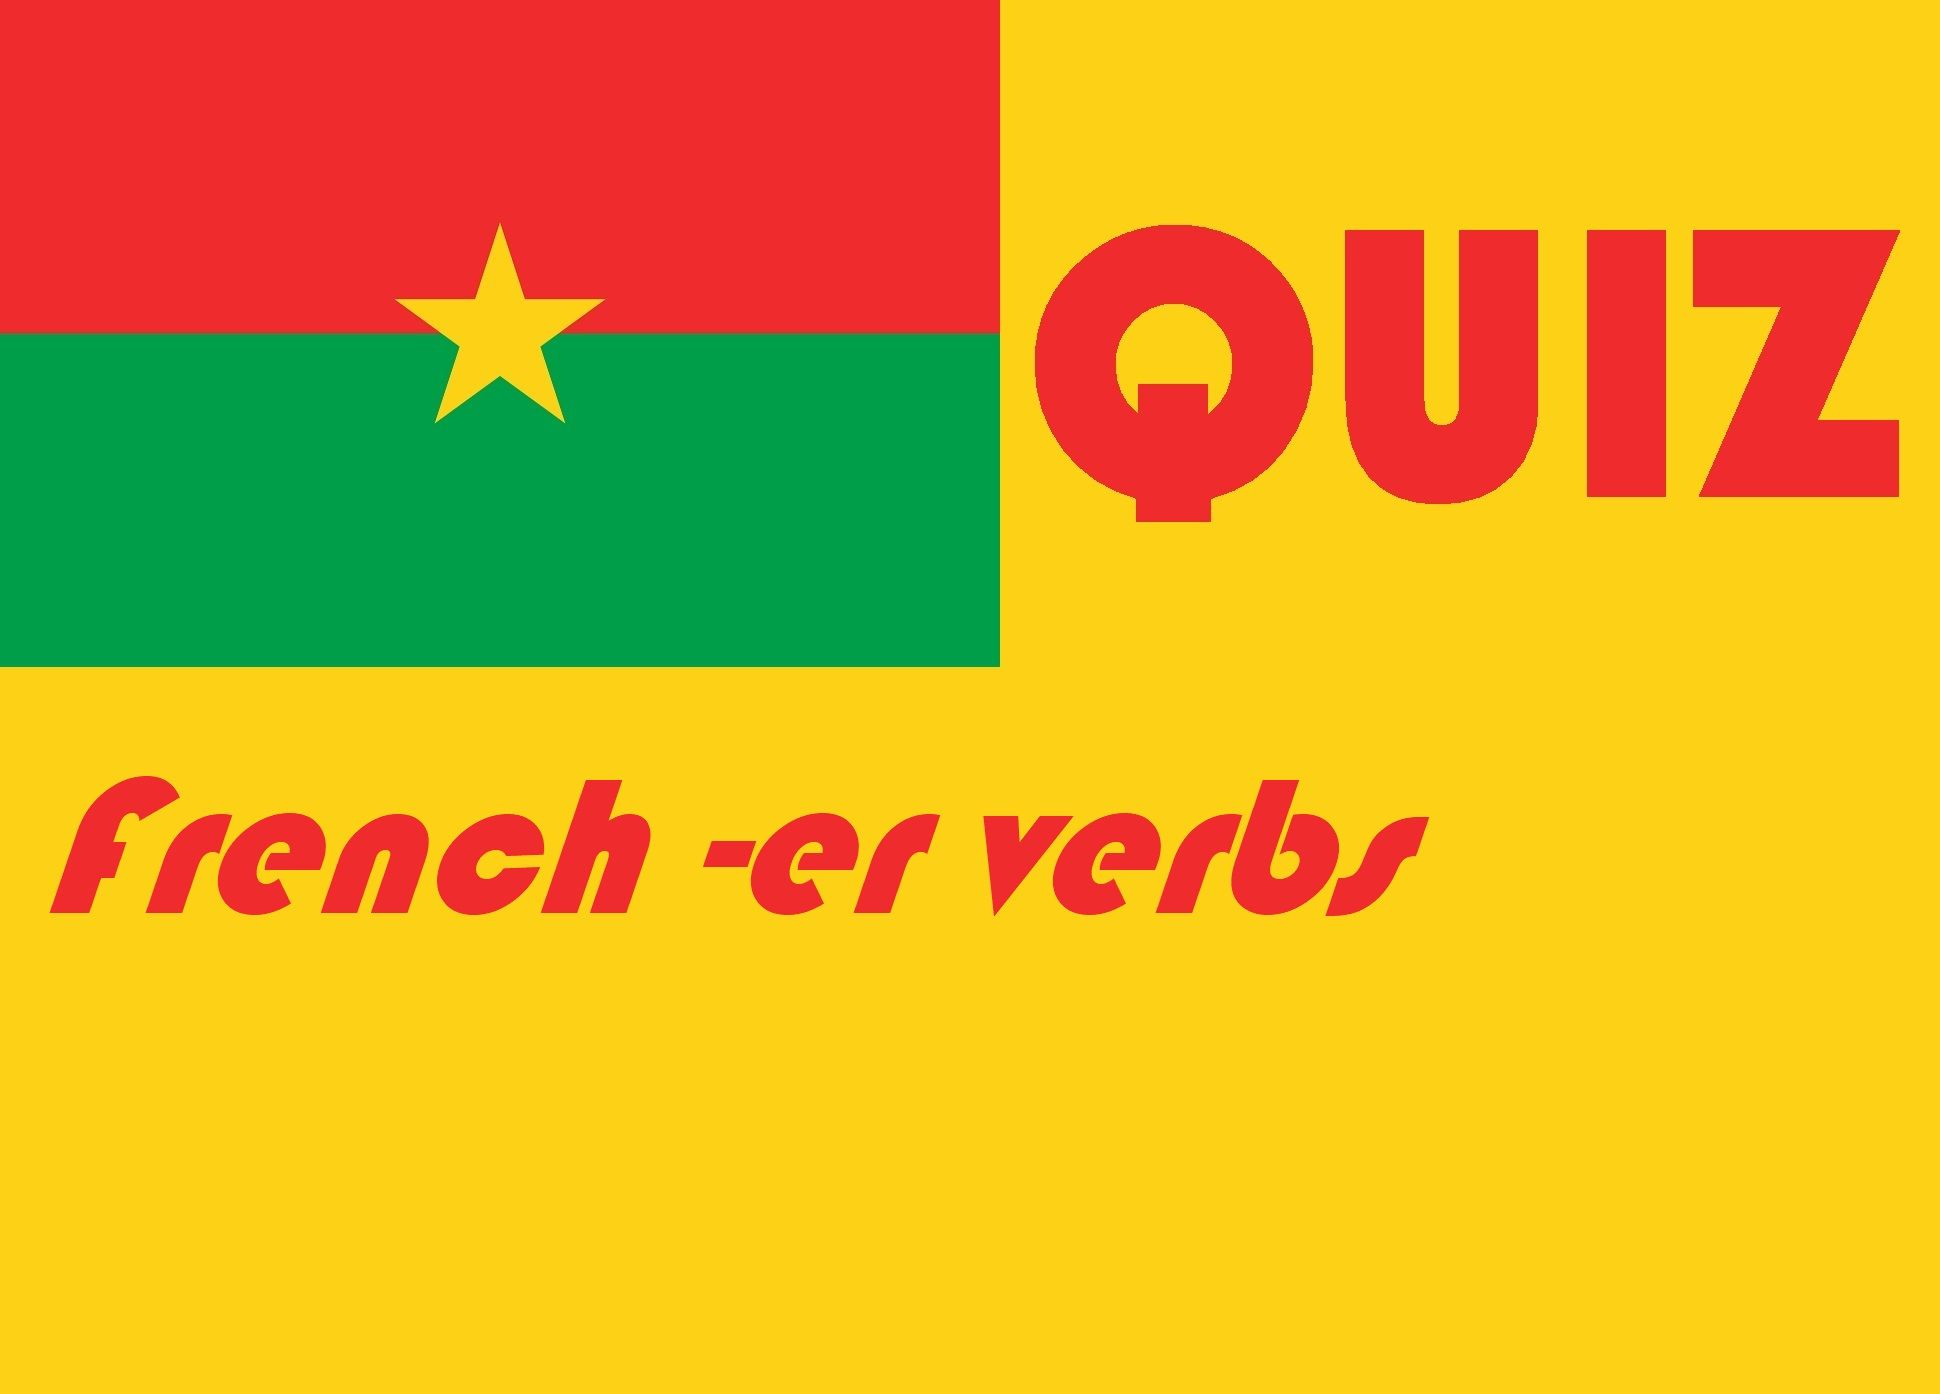 French Regular Er Present Tense Quiz Or Woksheet Quiz How To Find Out Sentences [ 1394 x 1940 Pixel ]